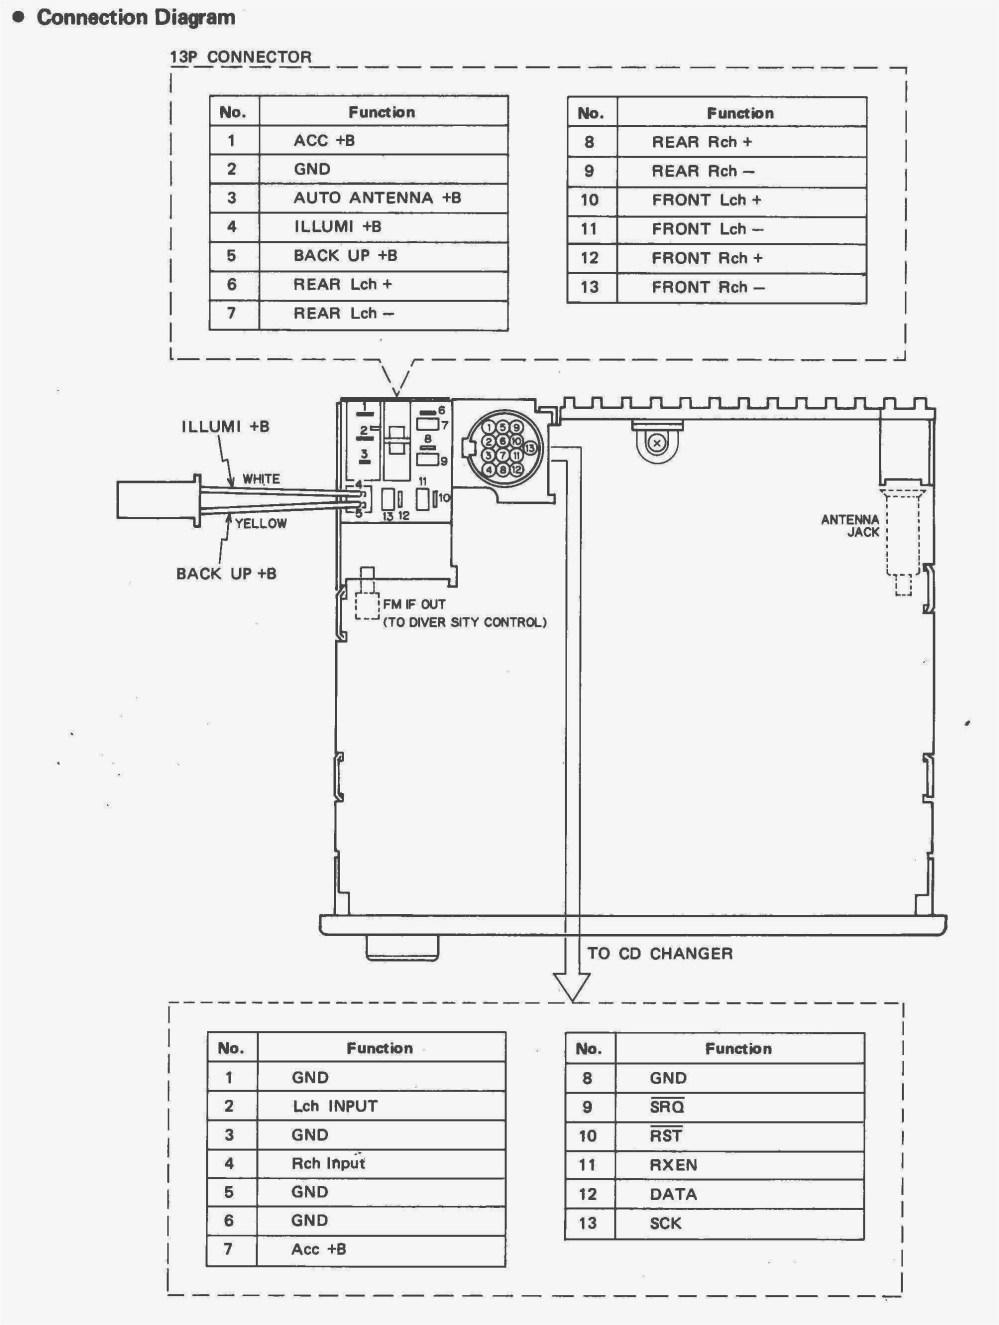 medium resolution of pioneer deh p8300ub wiring diagram wiring library rh 23 mac happen de pioneer deh x6500bt wiring diagram pioneer car stereo wiring diagram